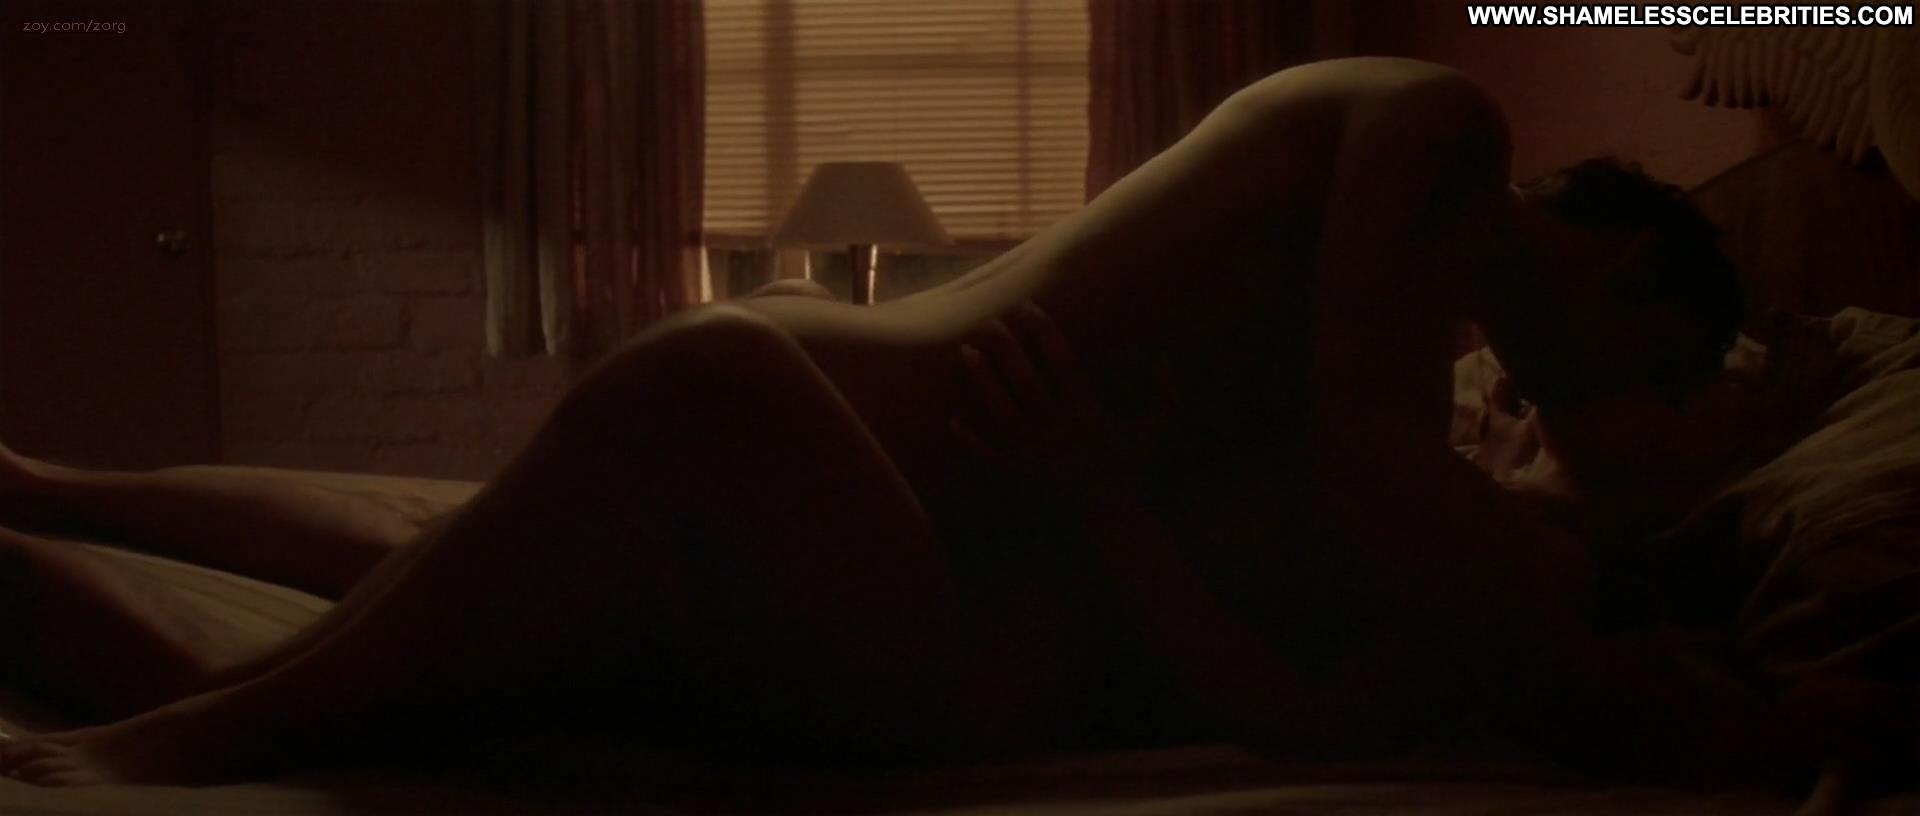 Women Sen Bob Menendez paid us for sex in the Dominican